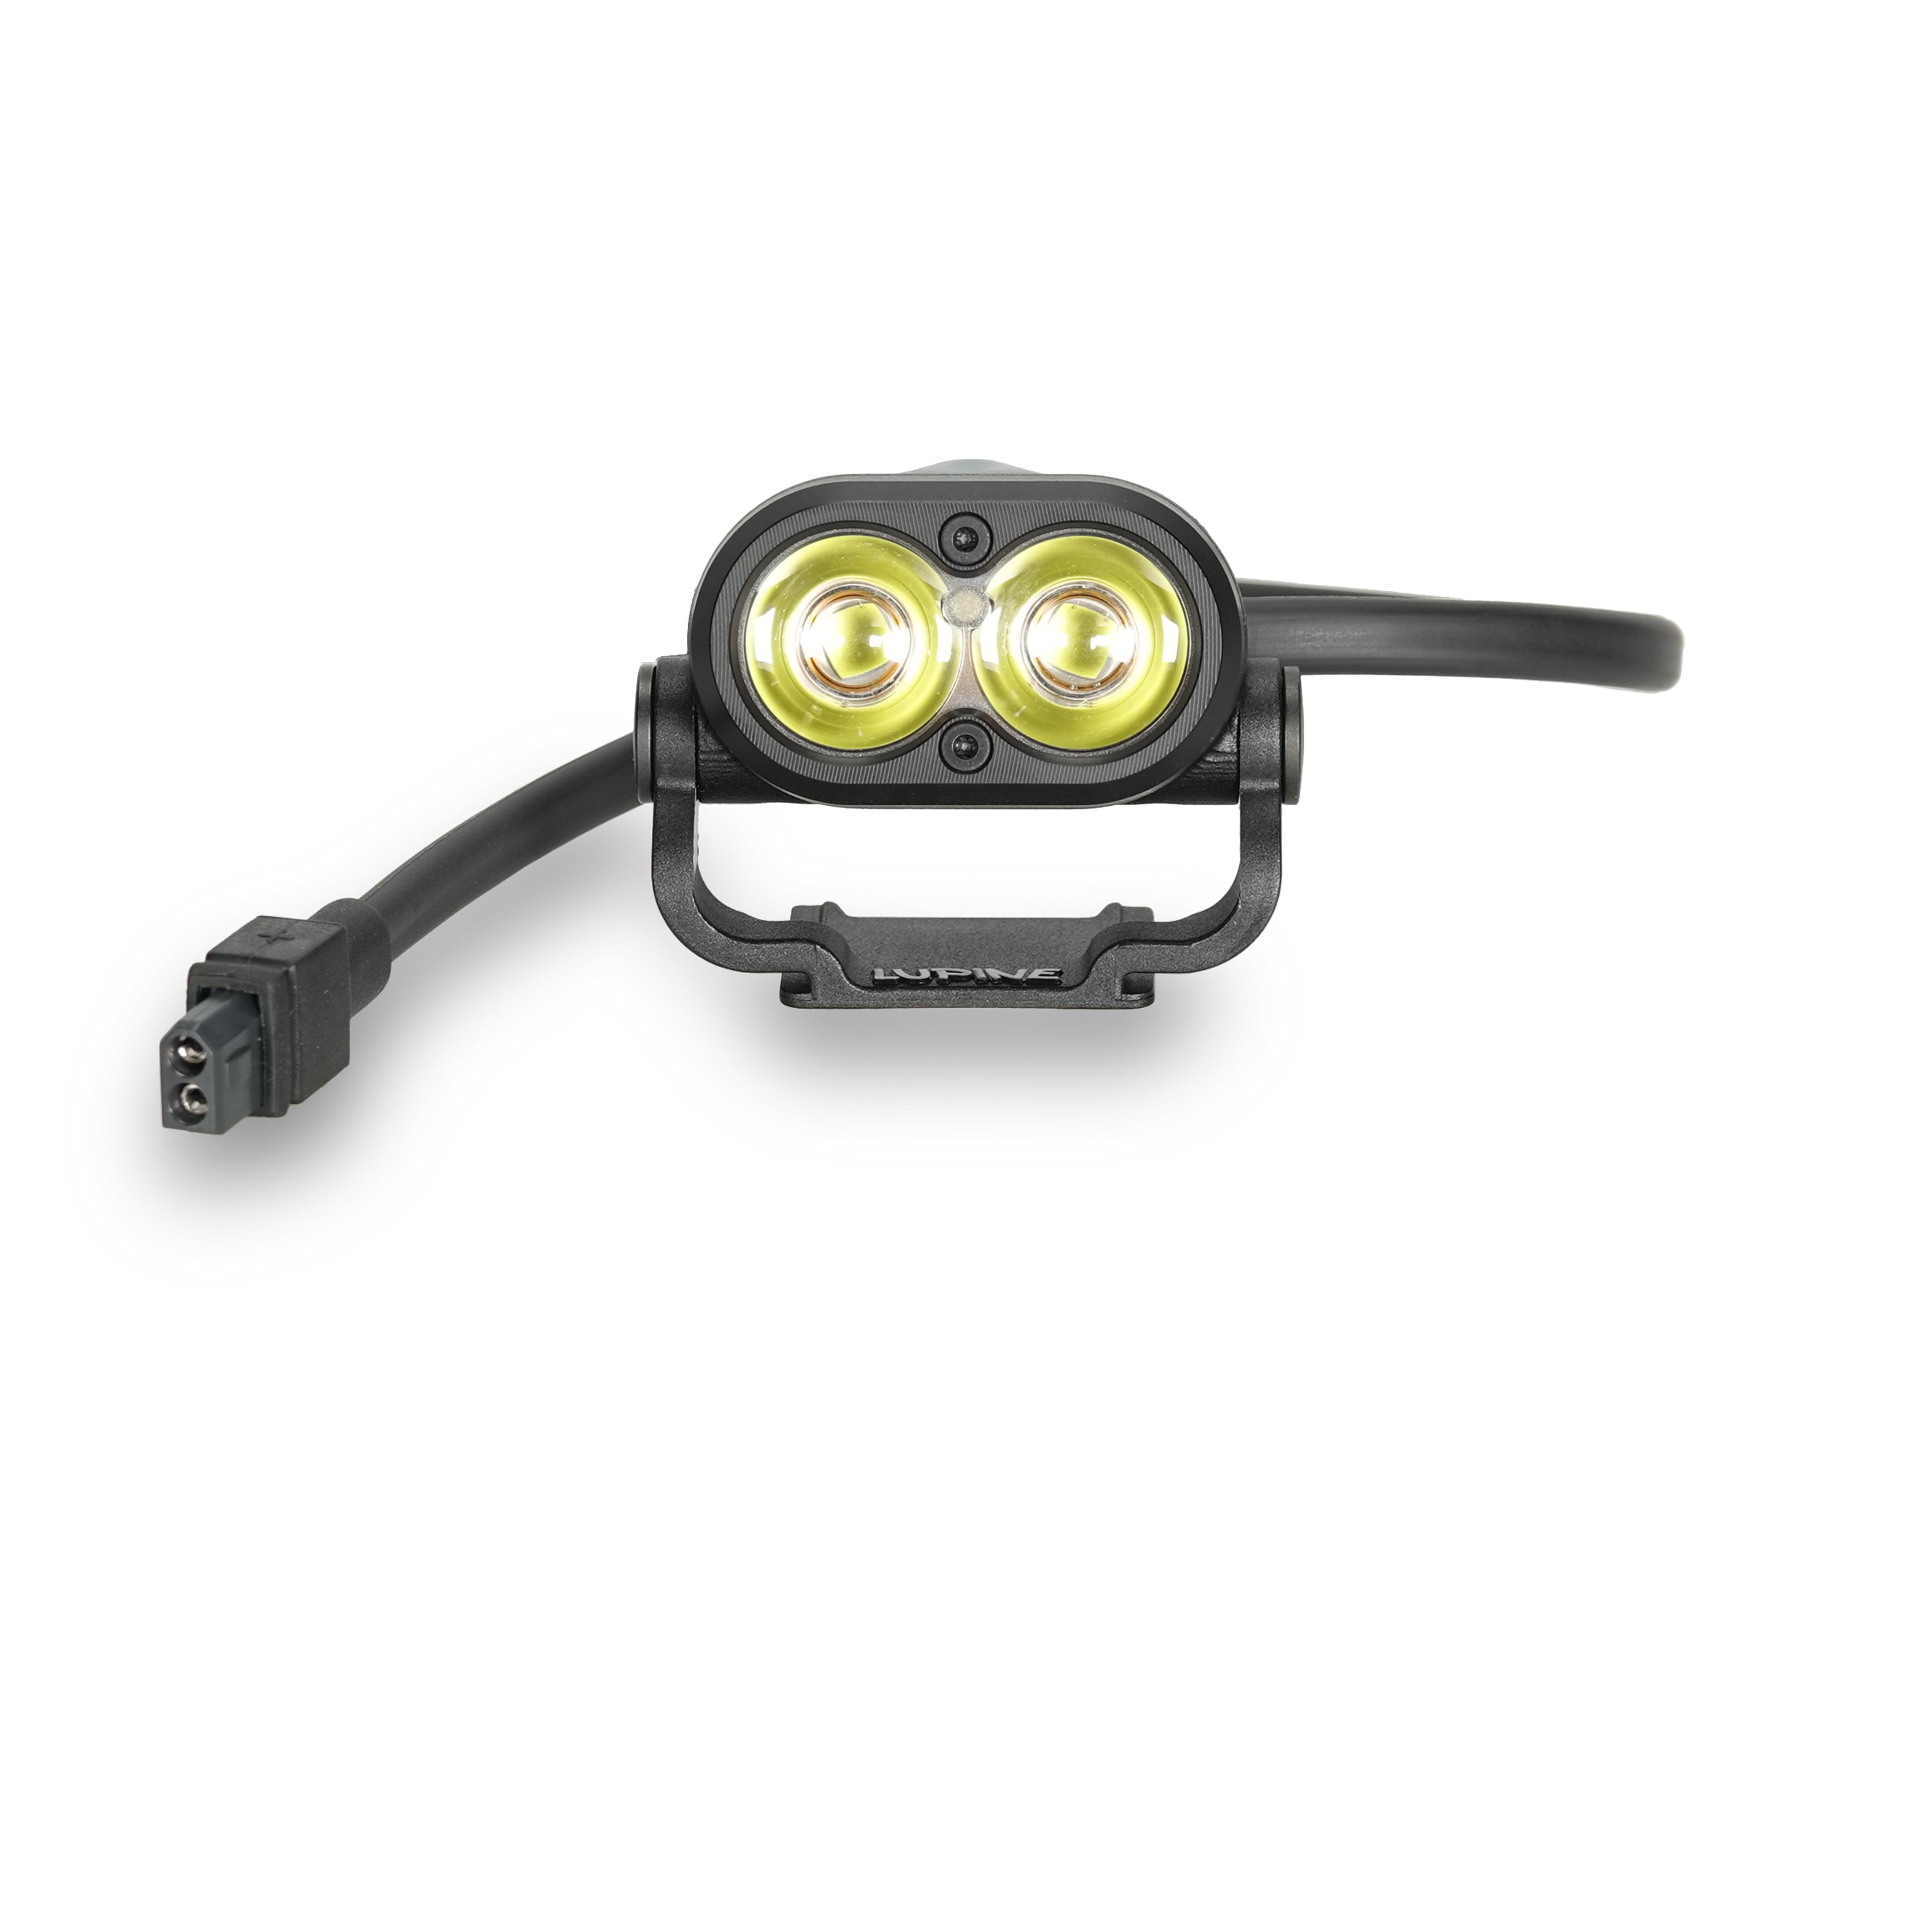 Lupine Piko 4 SmartCore (1.900 Lumen)